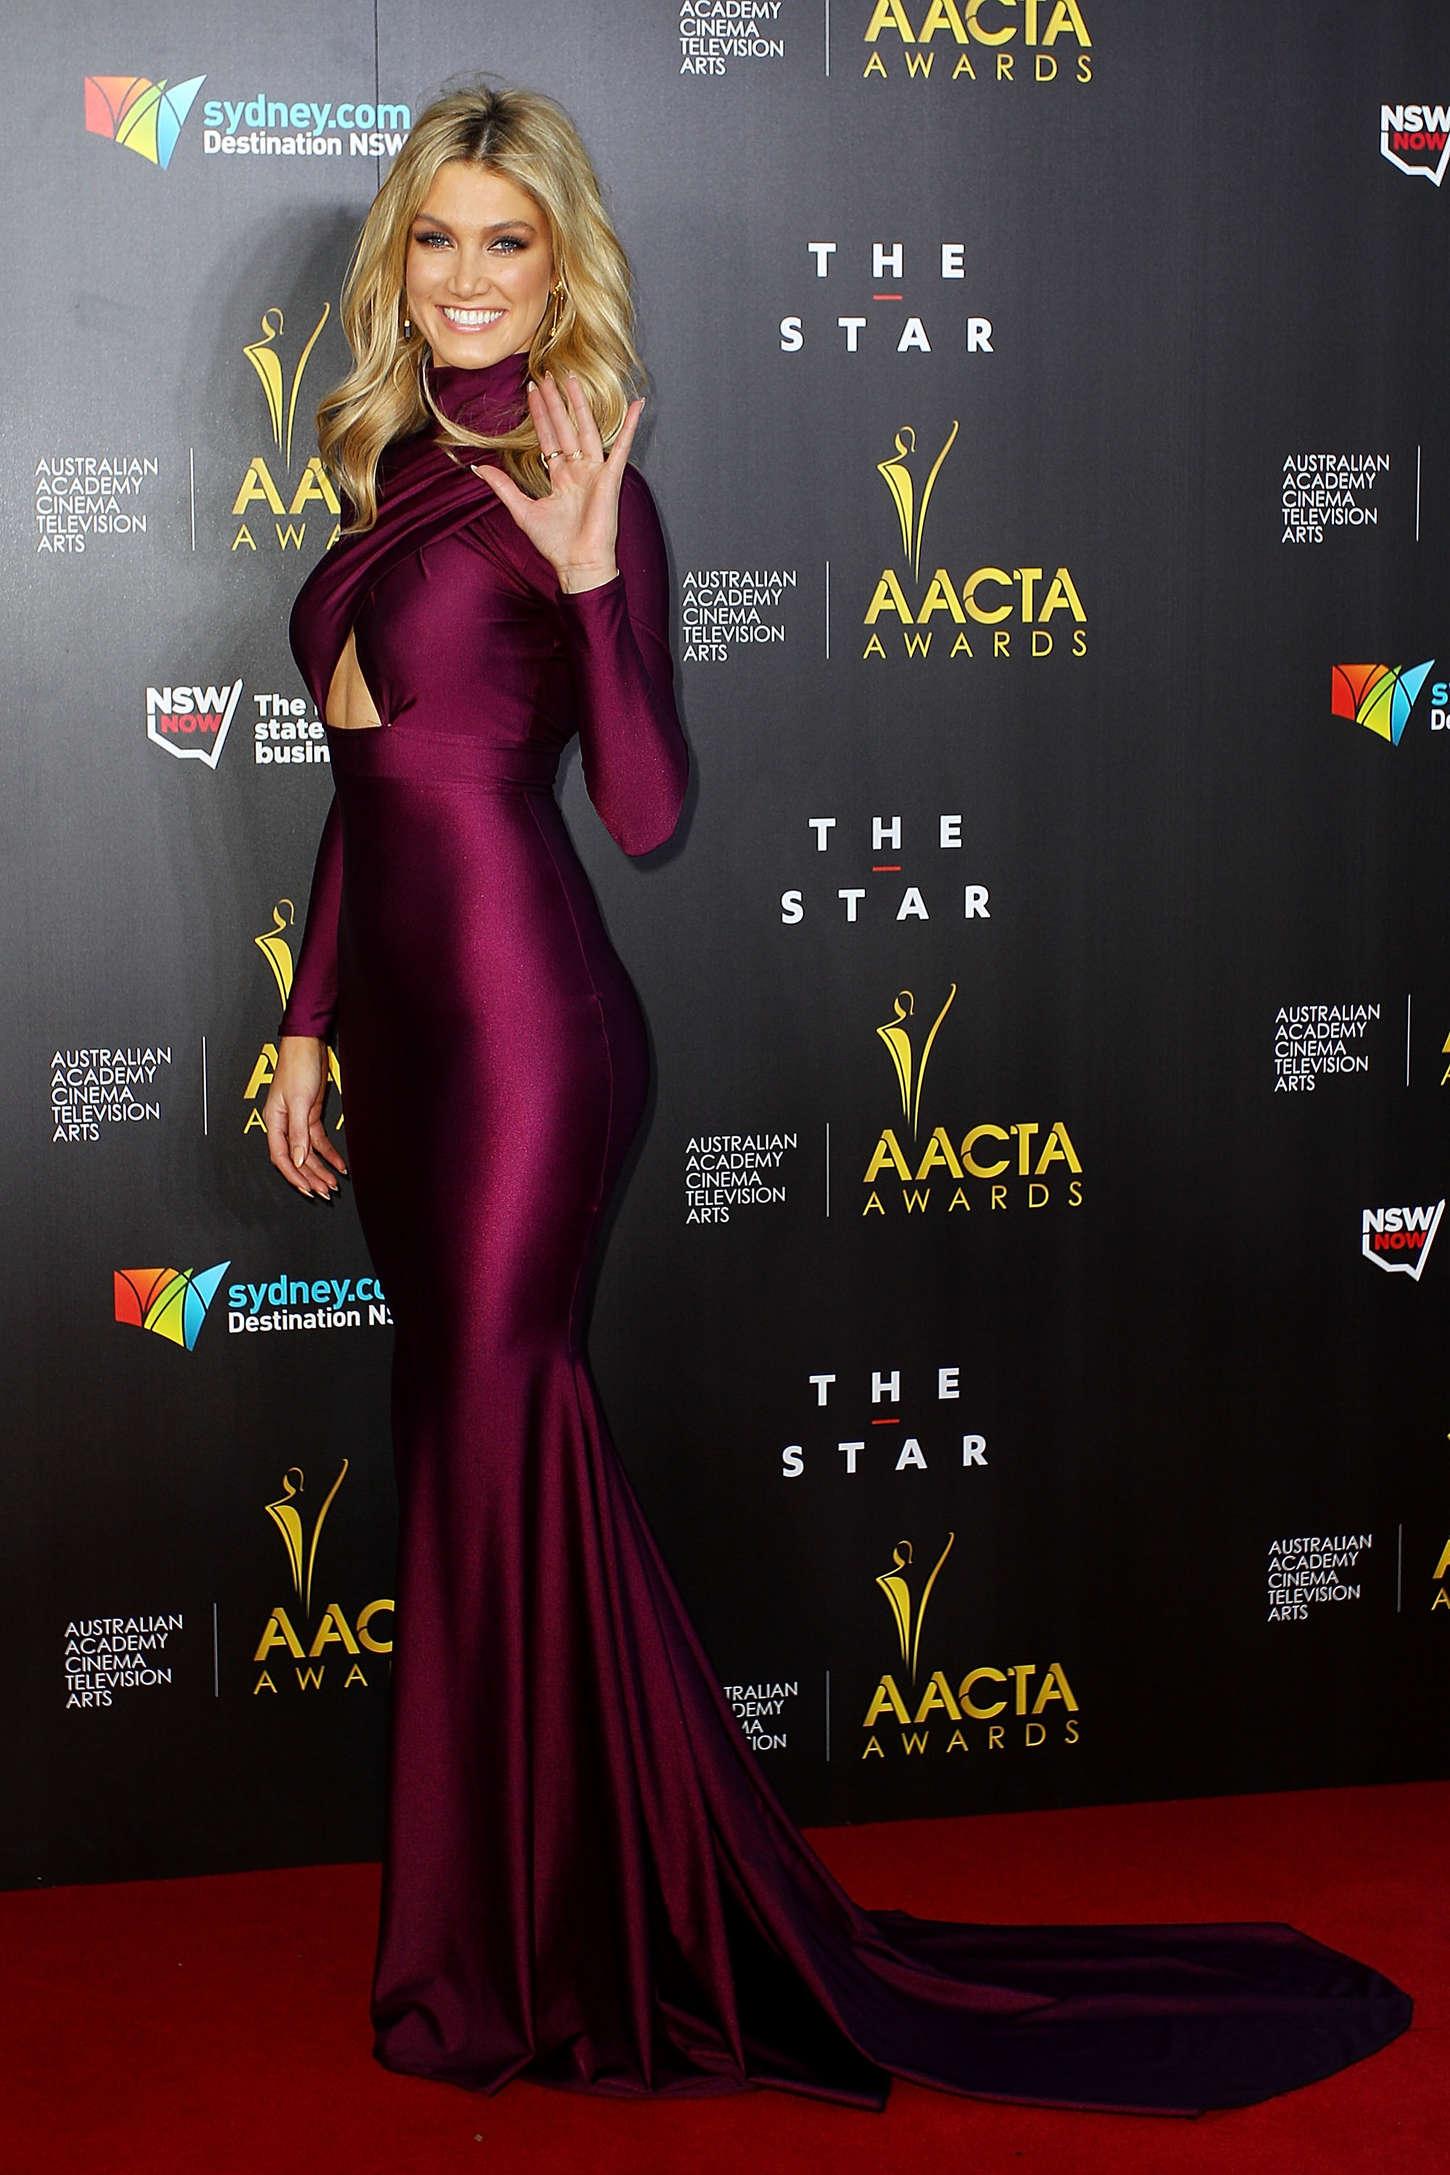 aacta awards - photo #24